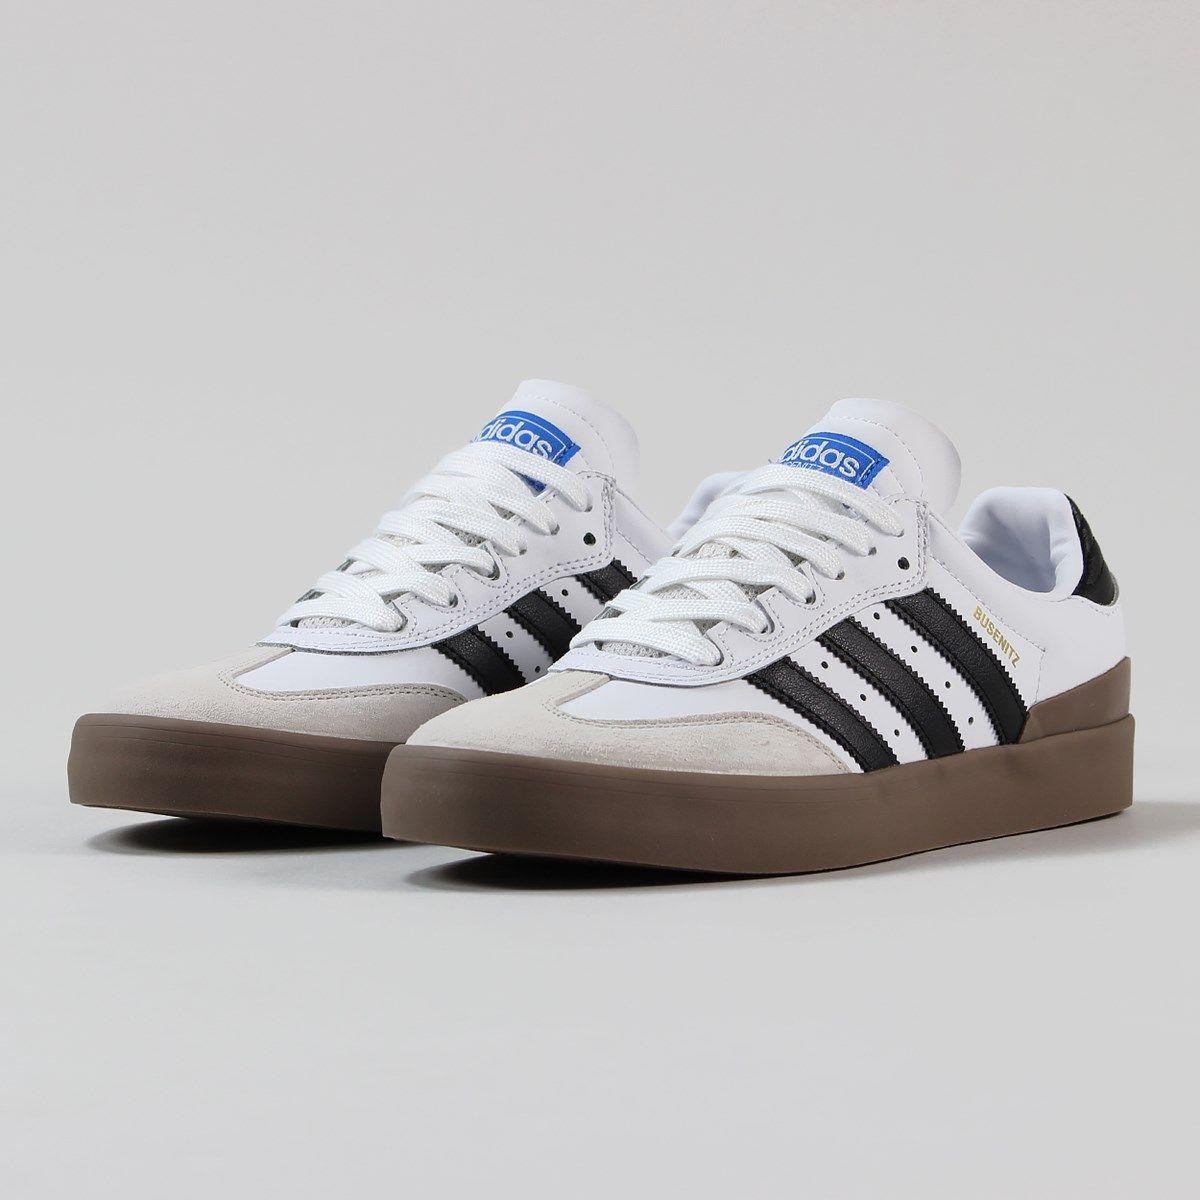 Adidas Busenitz Vulc Samba Edition Shoes White Black Blue